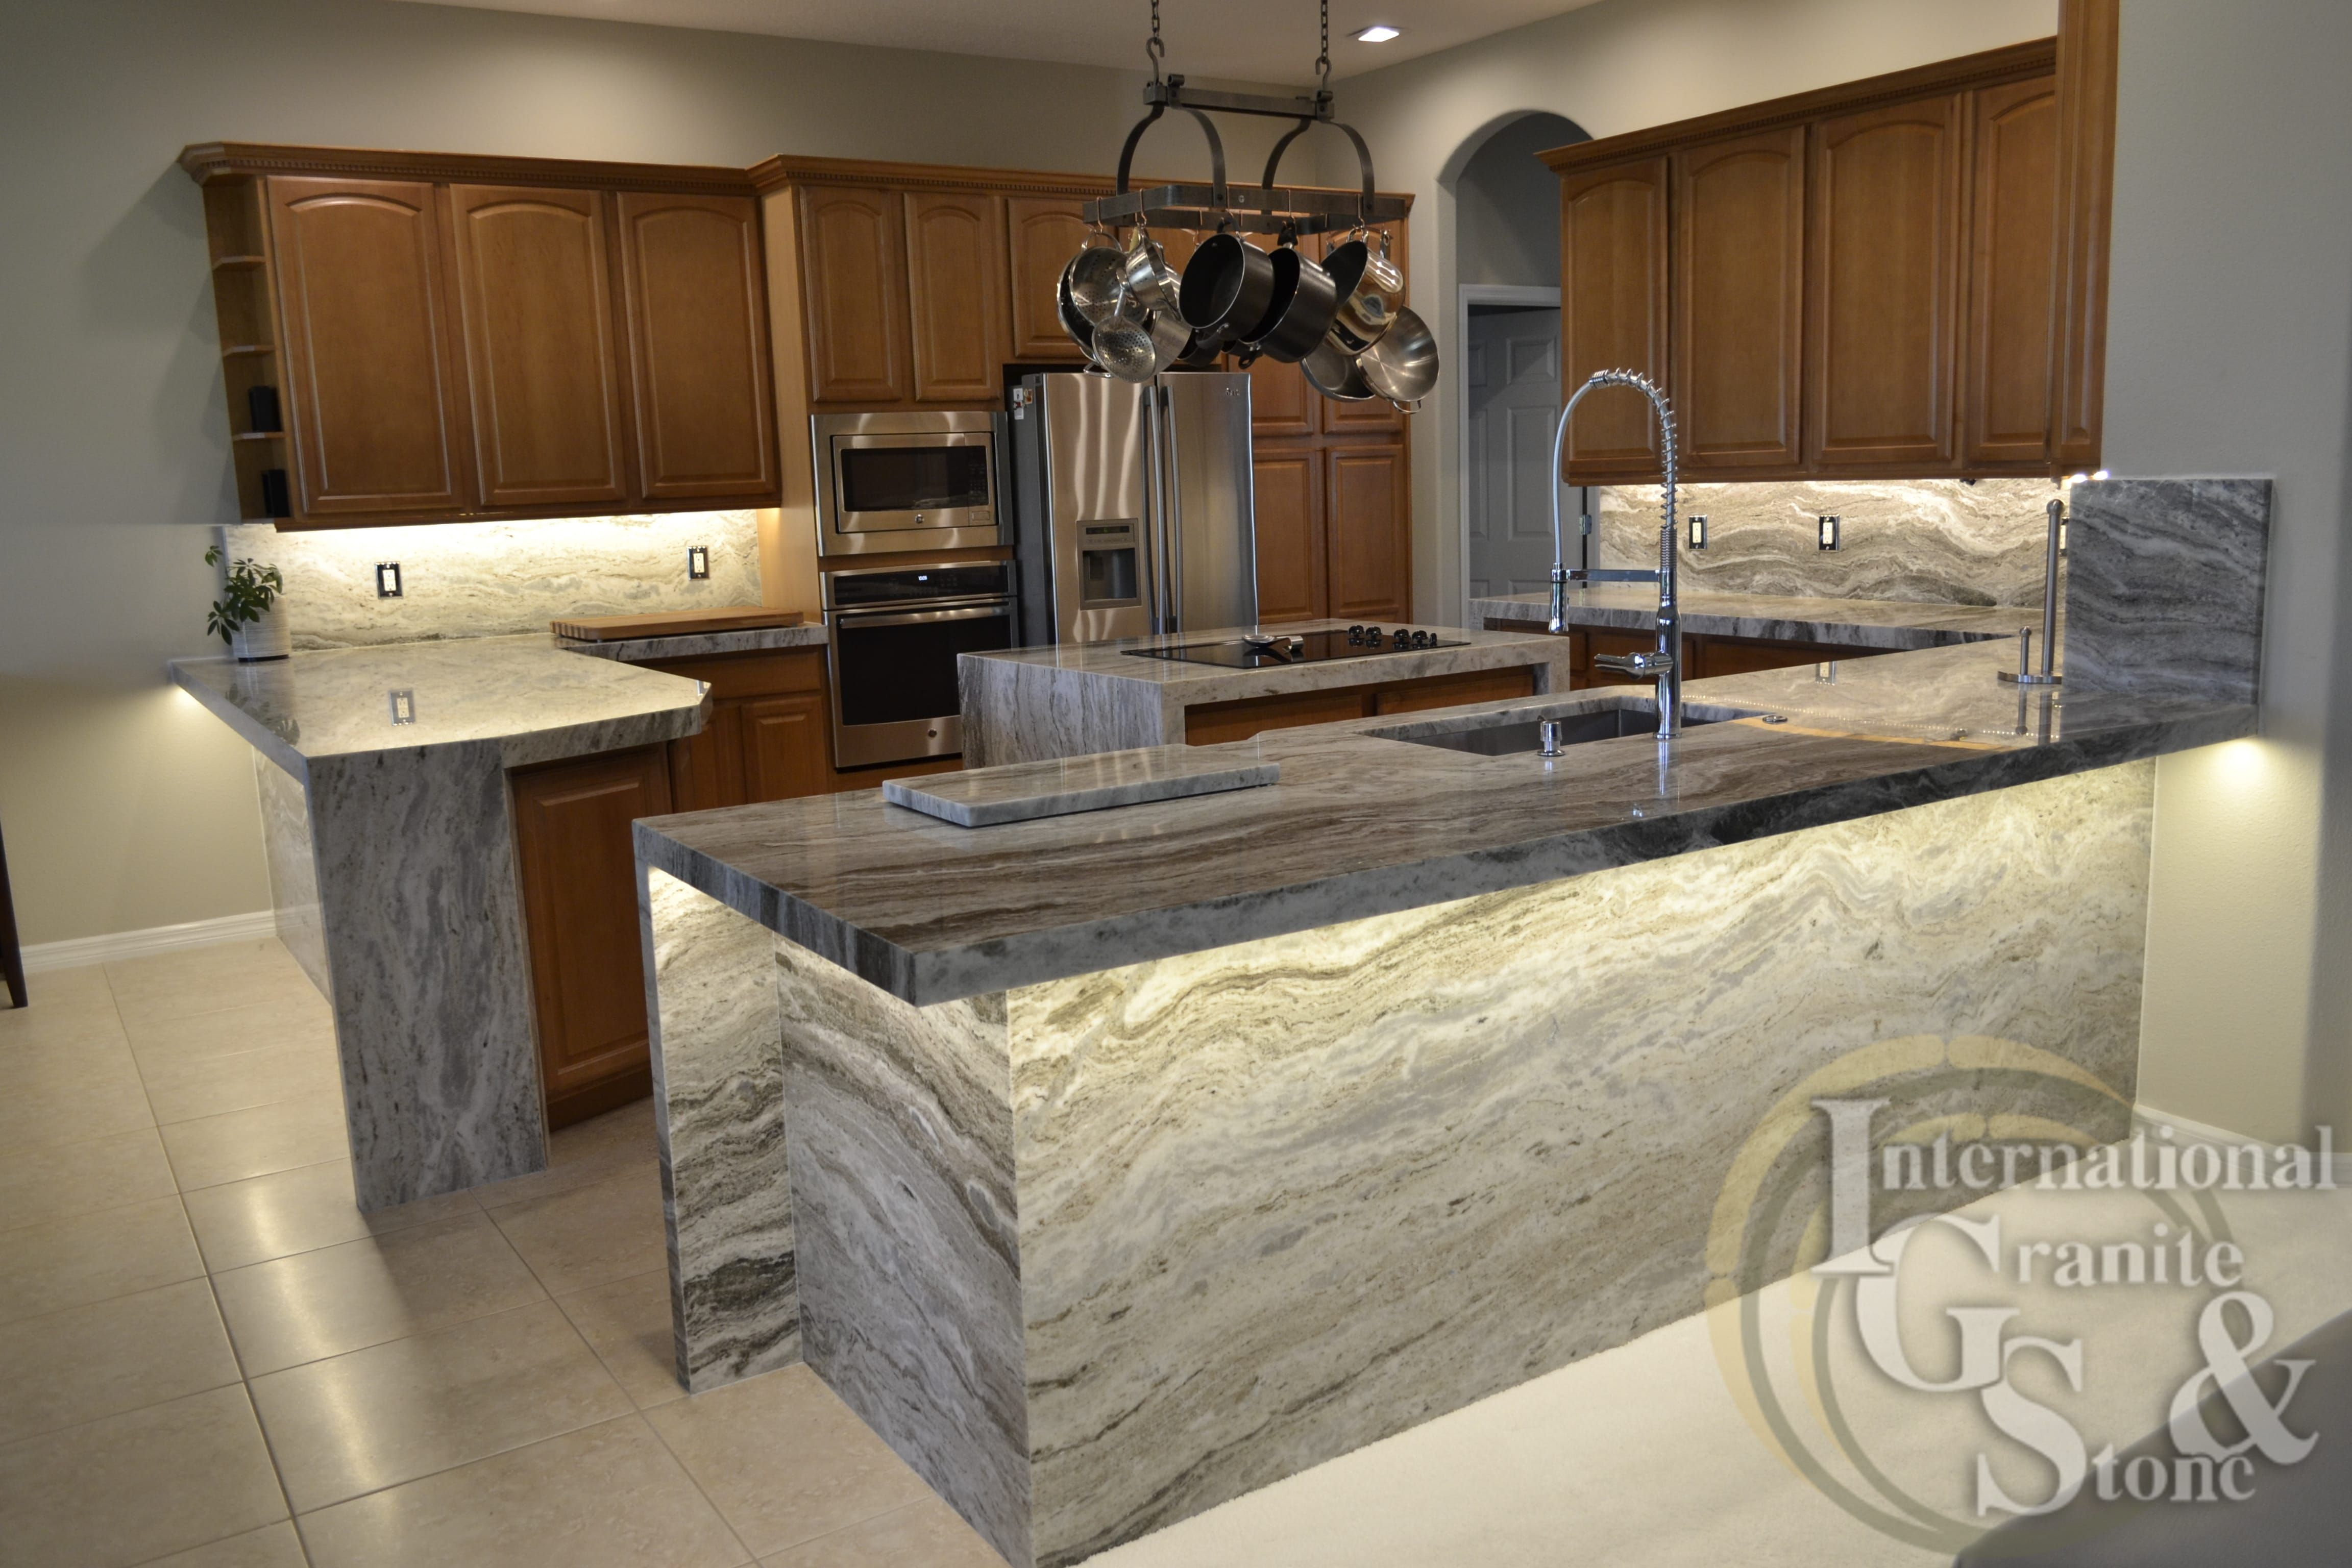 Granite Countertops Spring Hill Kitchen Installation Granite Countertops Kitchen Design